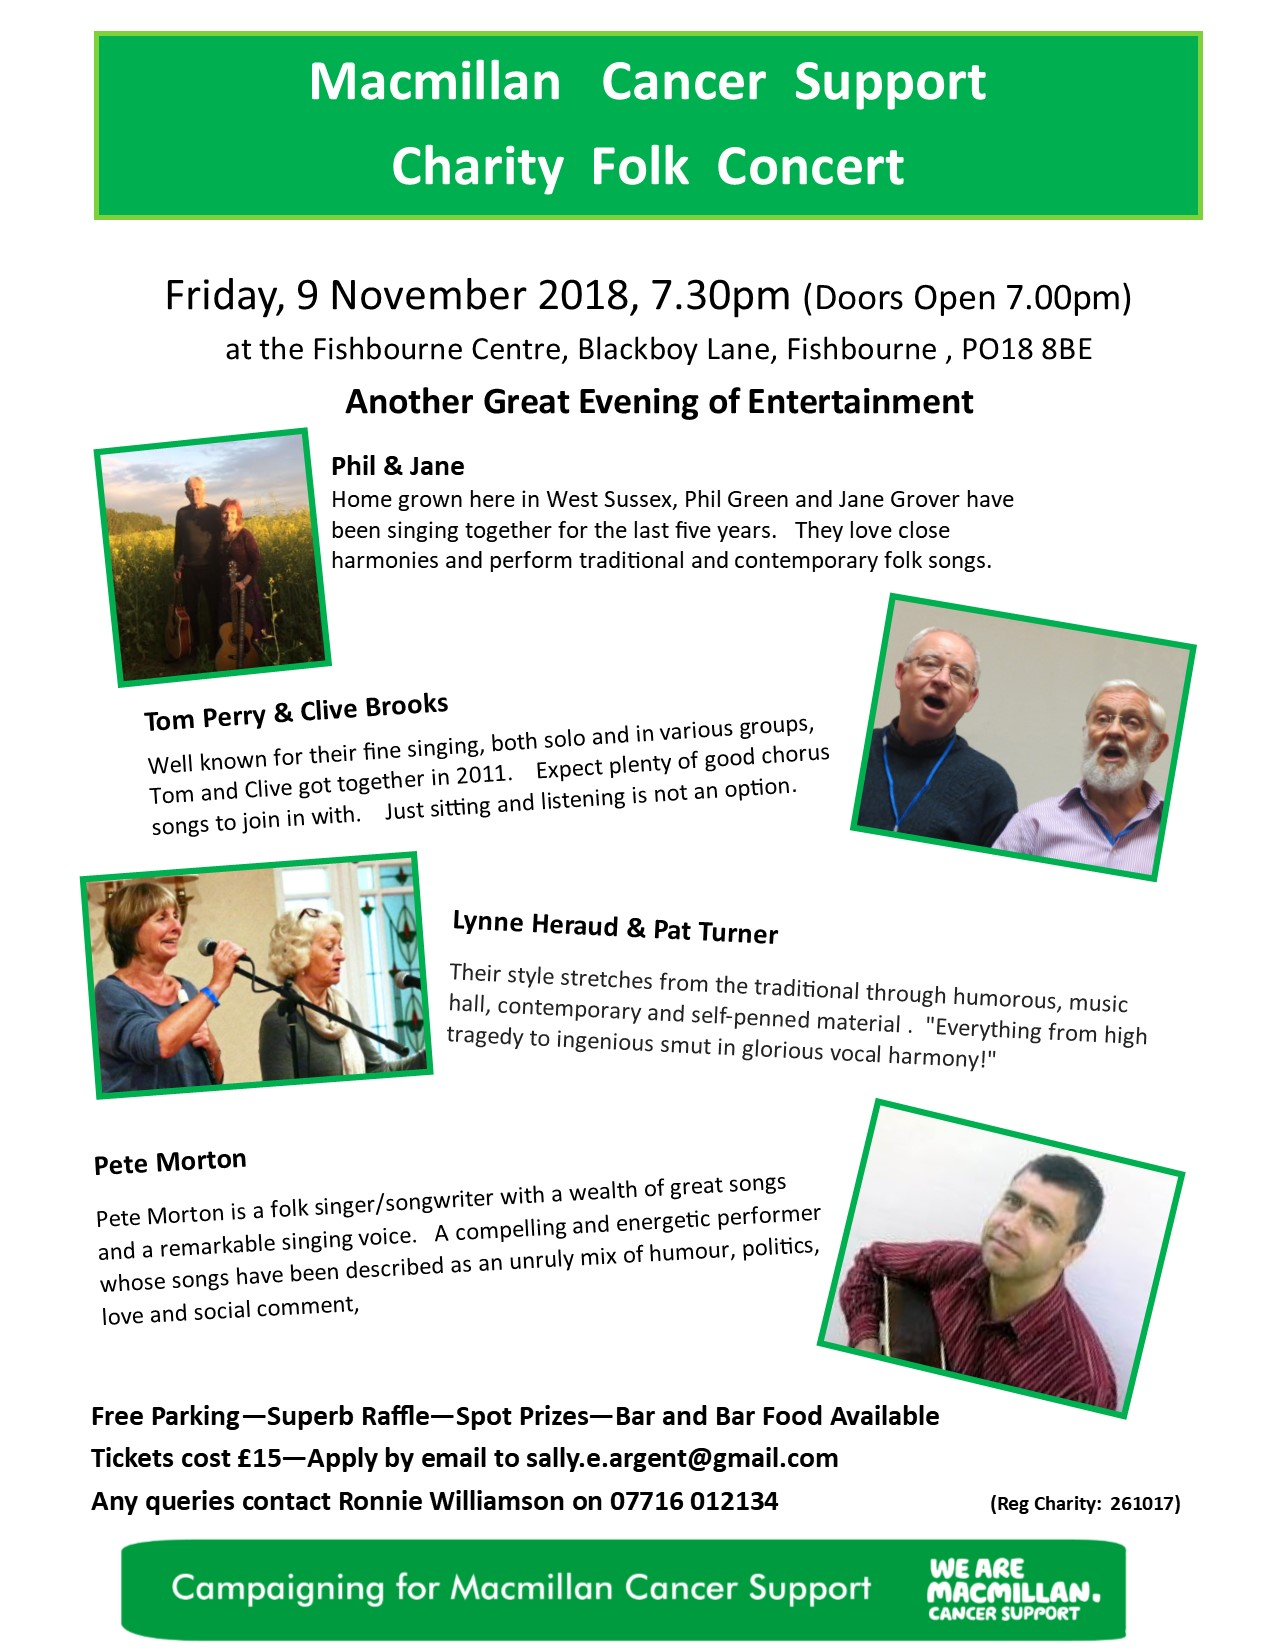 Macmillan Charity Folk Concert